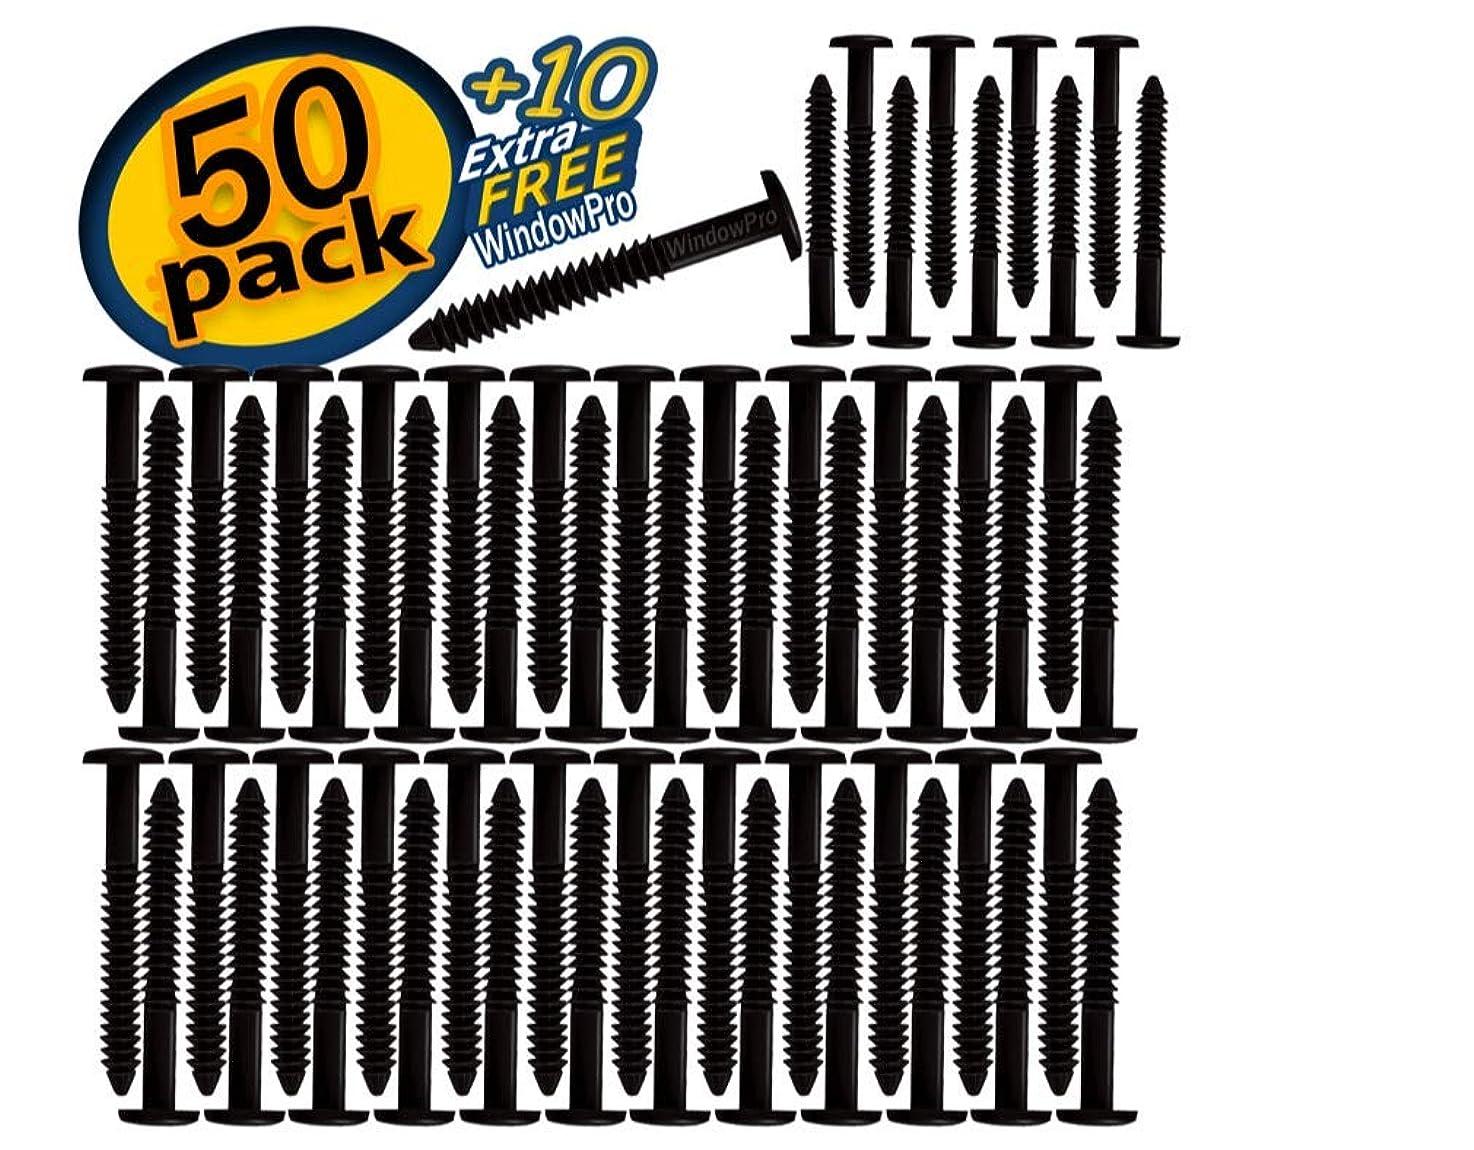 Window Shutters Panel Peg Lok Pin Screws Spikes 3 inch 60 Pack (Black) Exterior Vinyl Shutter Hardware Strongest Made in USA hogtsihbfyxwd2